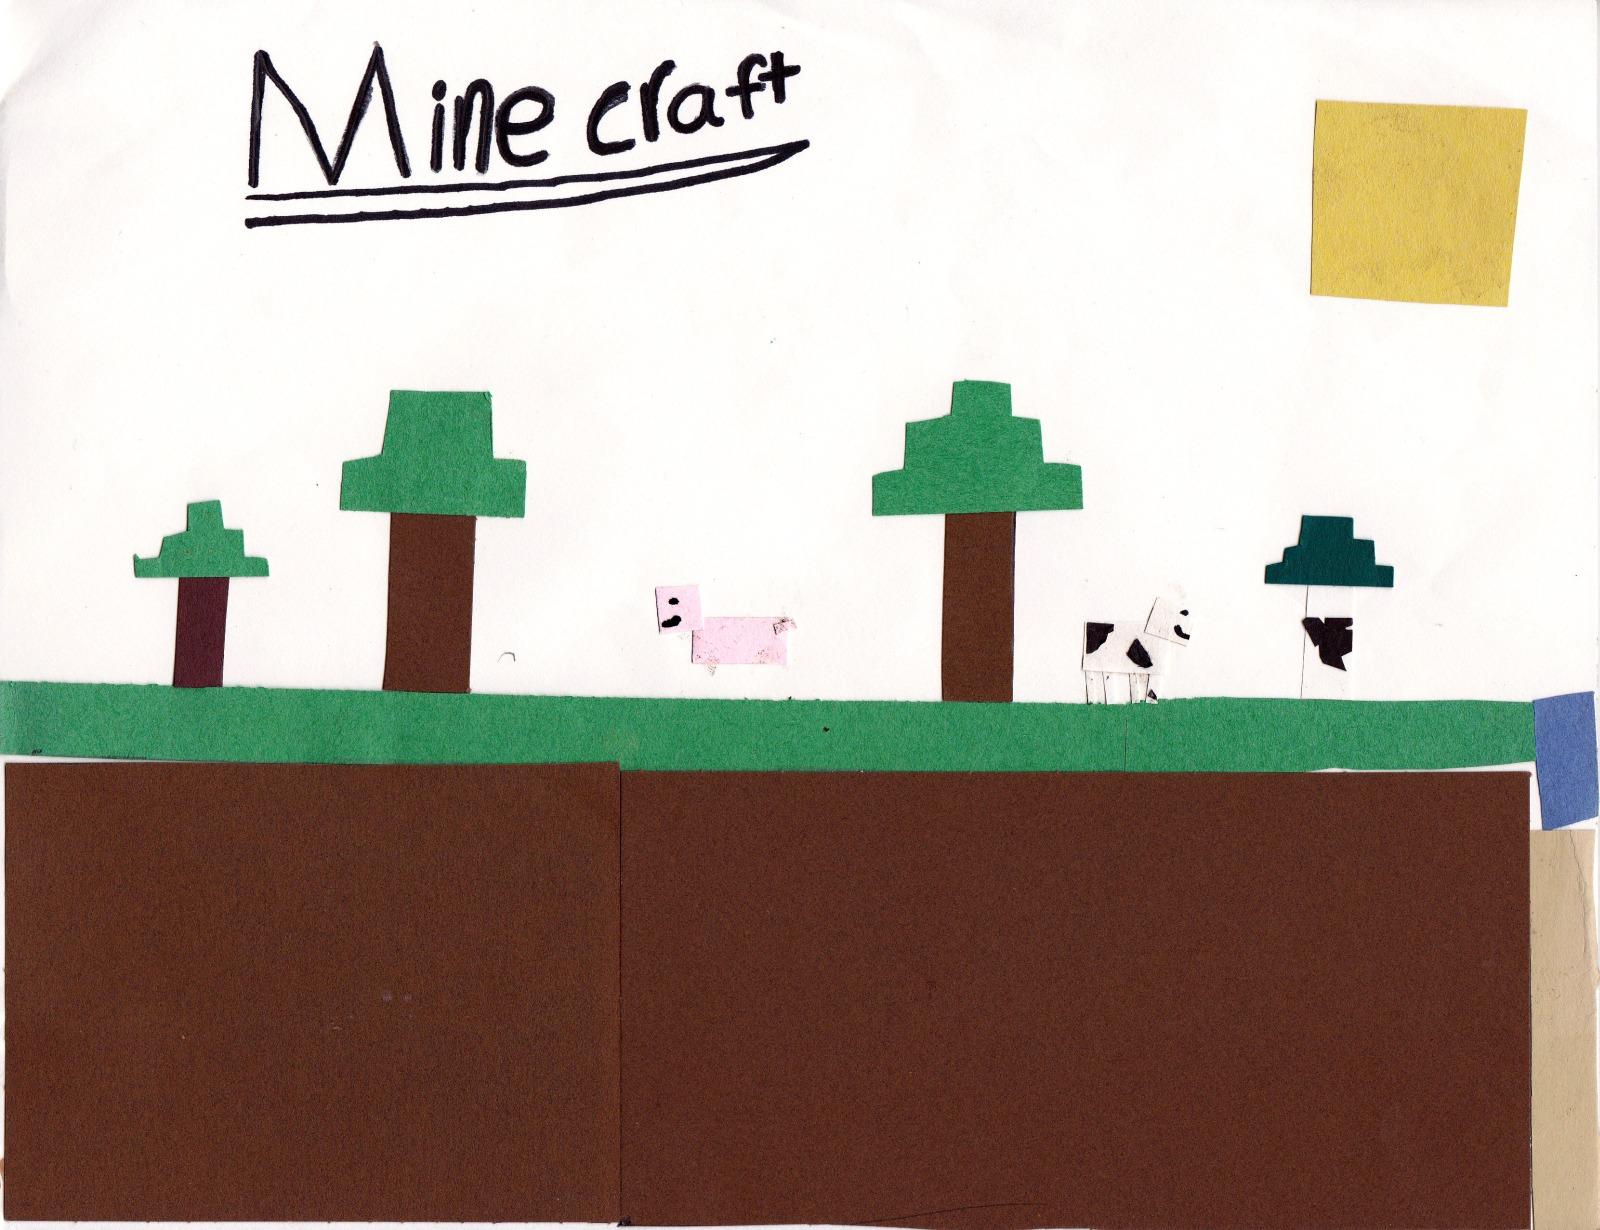 Mine Craft, artwork by Jesse Toland